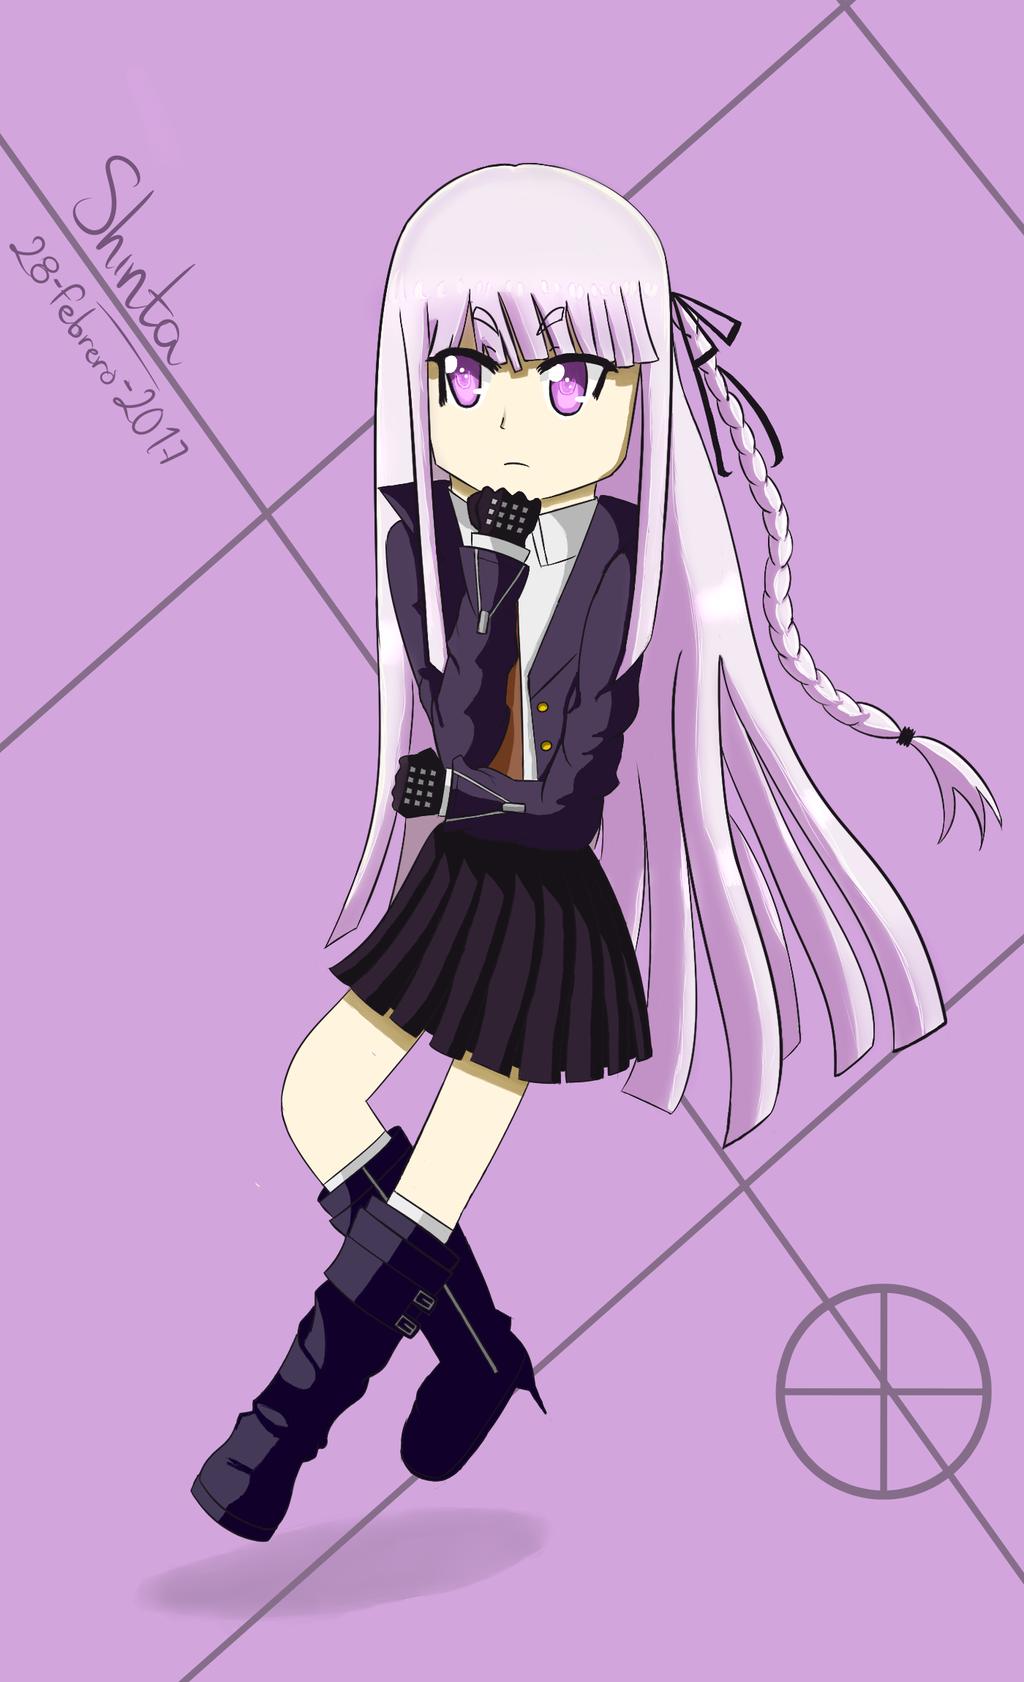 Kyoko Kirigiri by Shintaragi